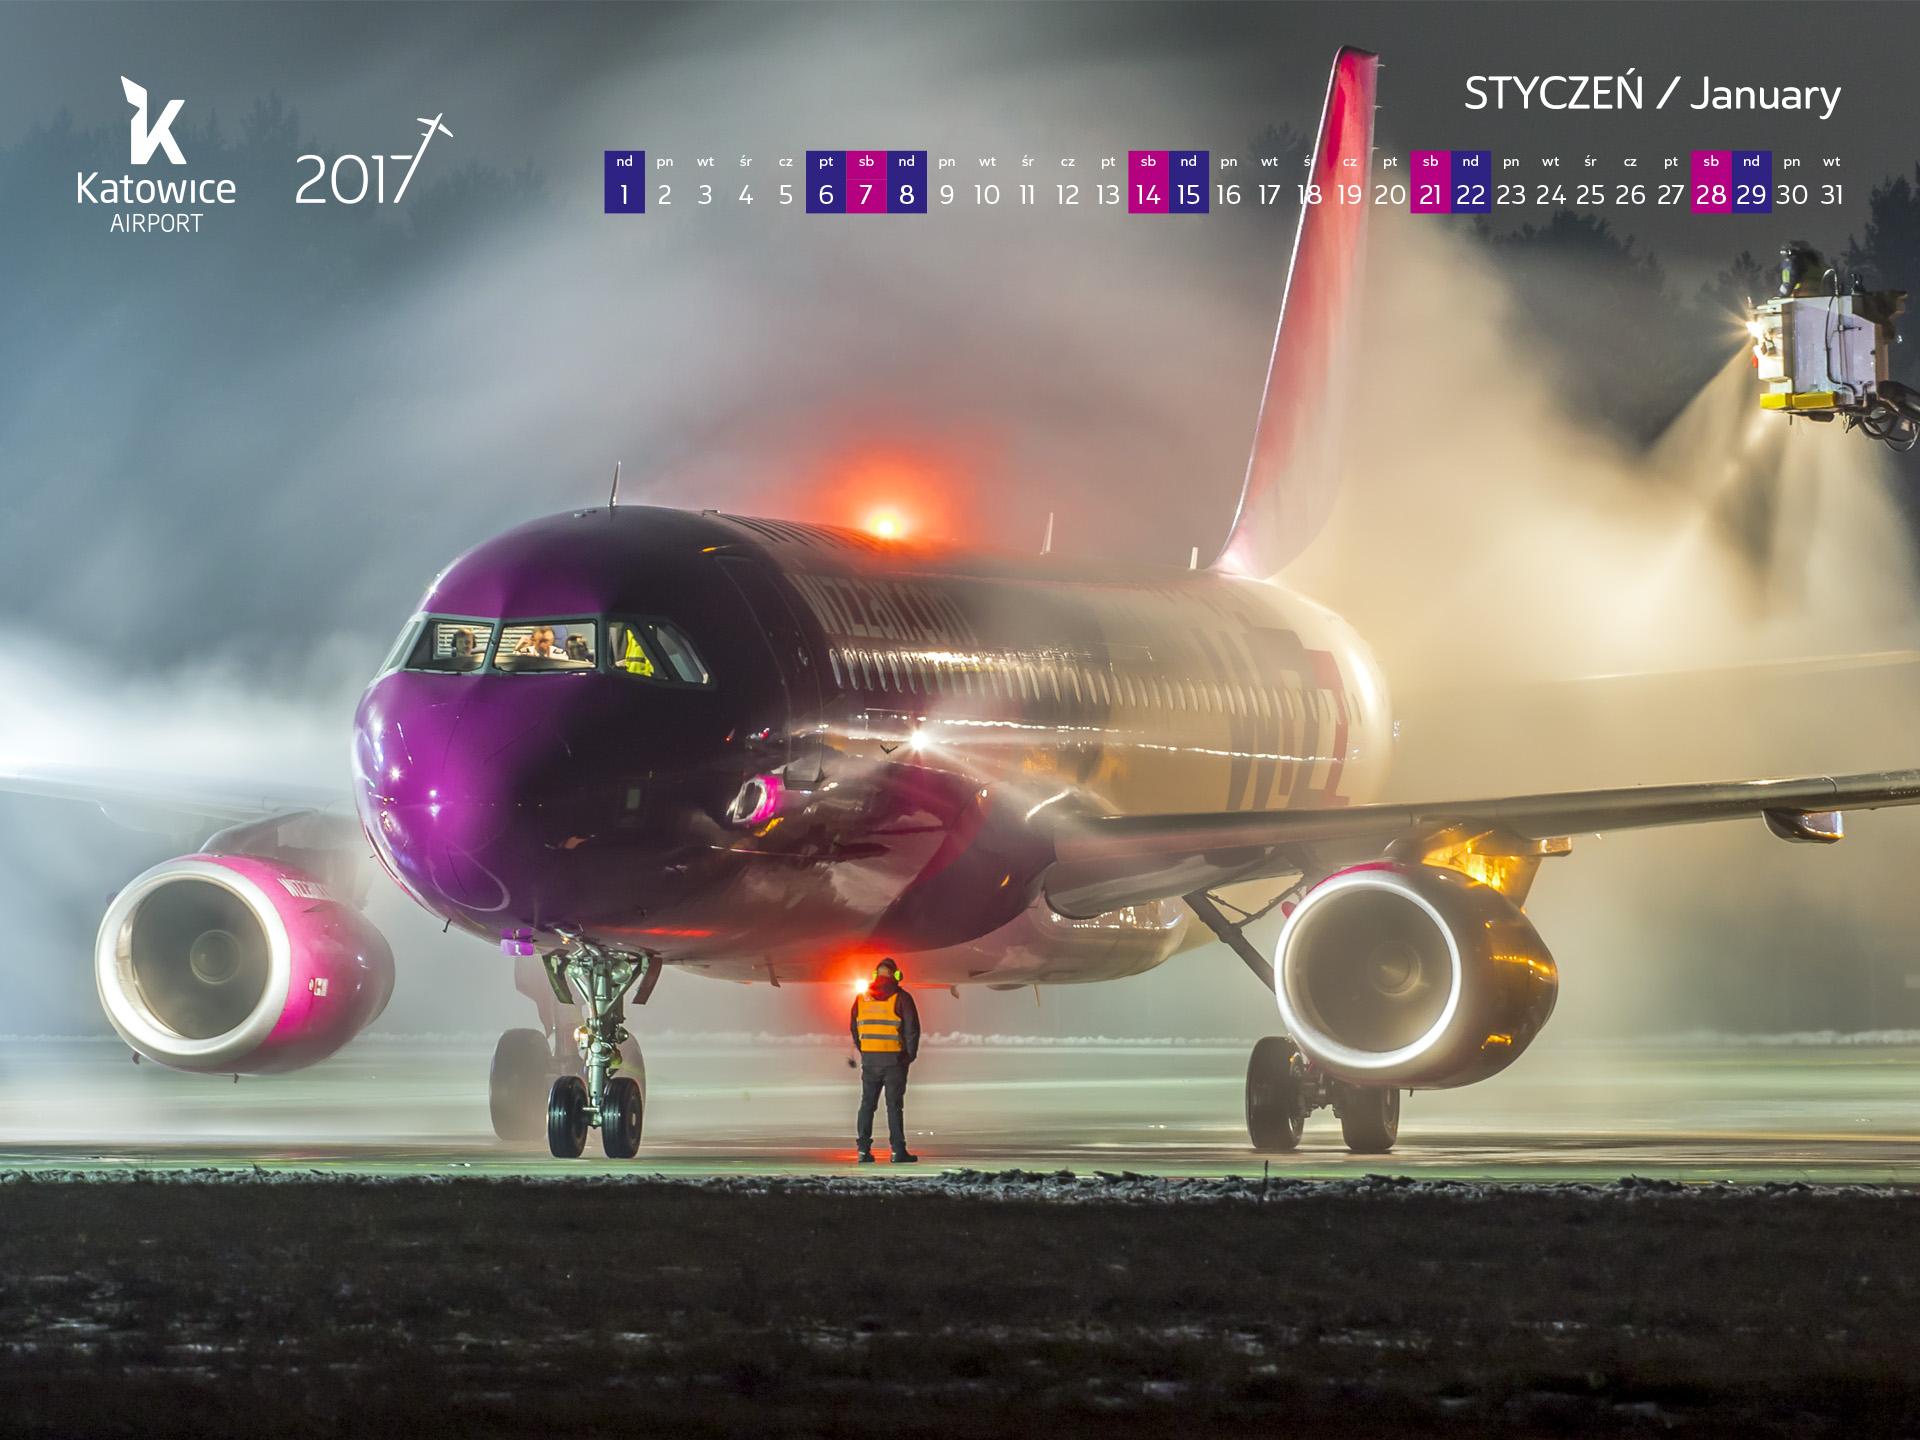 katowice_airport_4x3